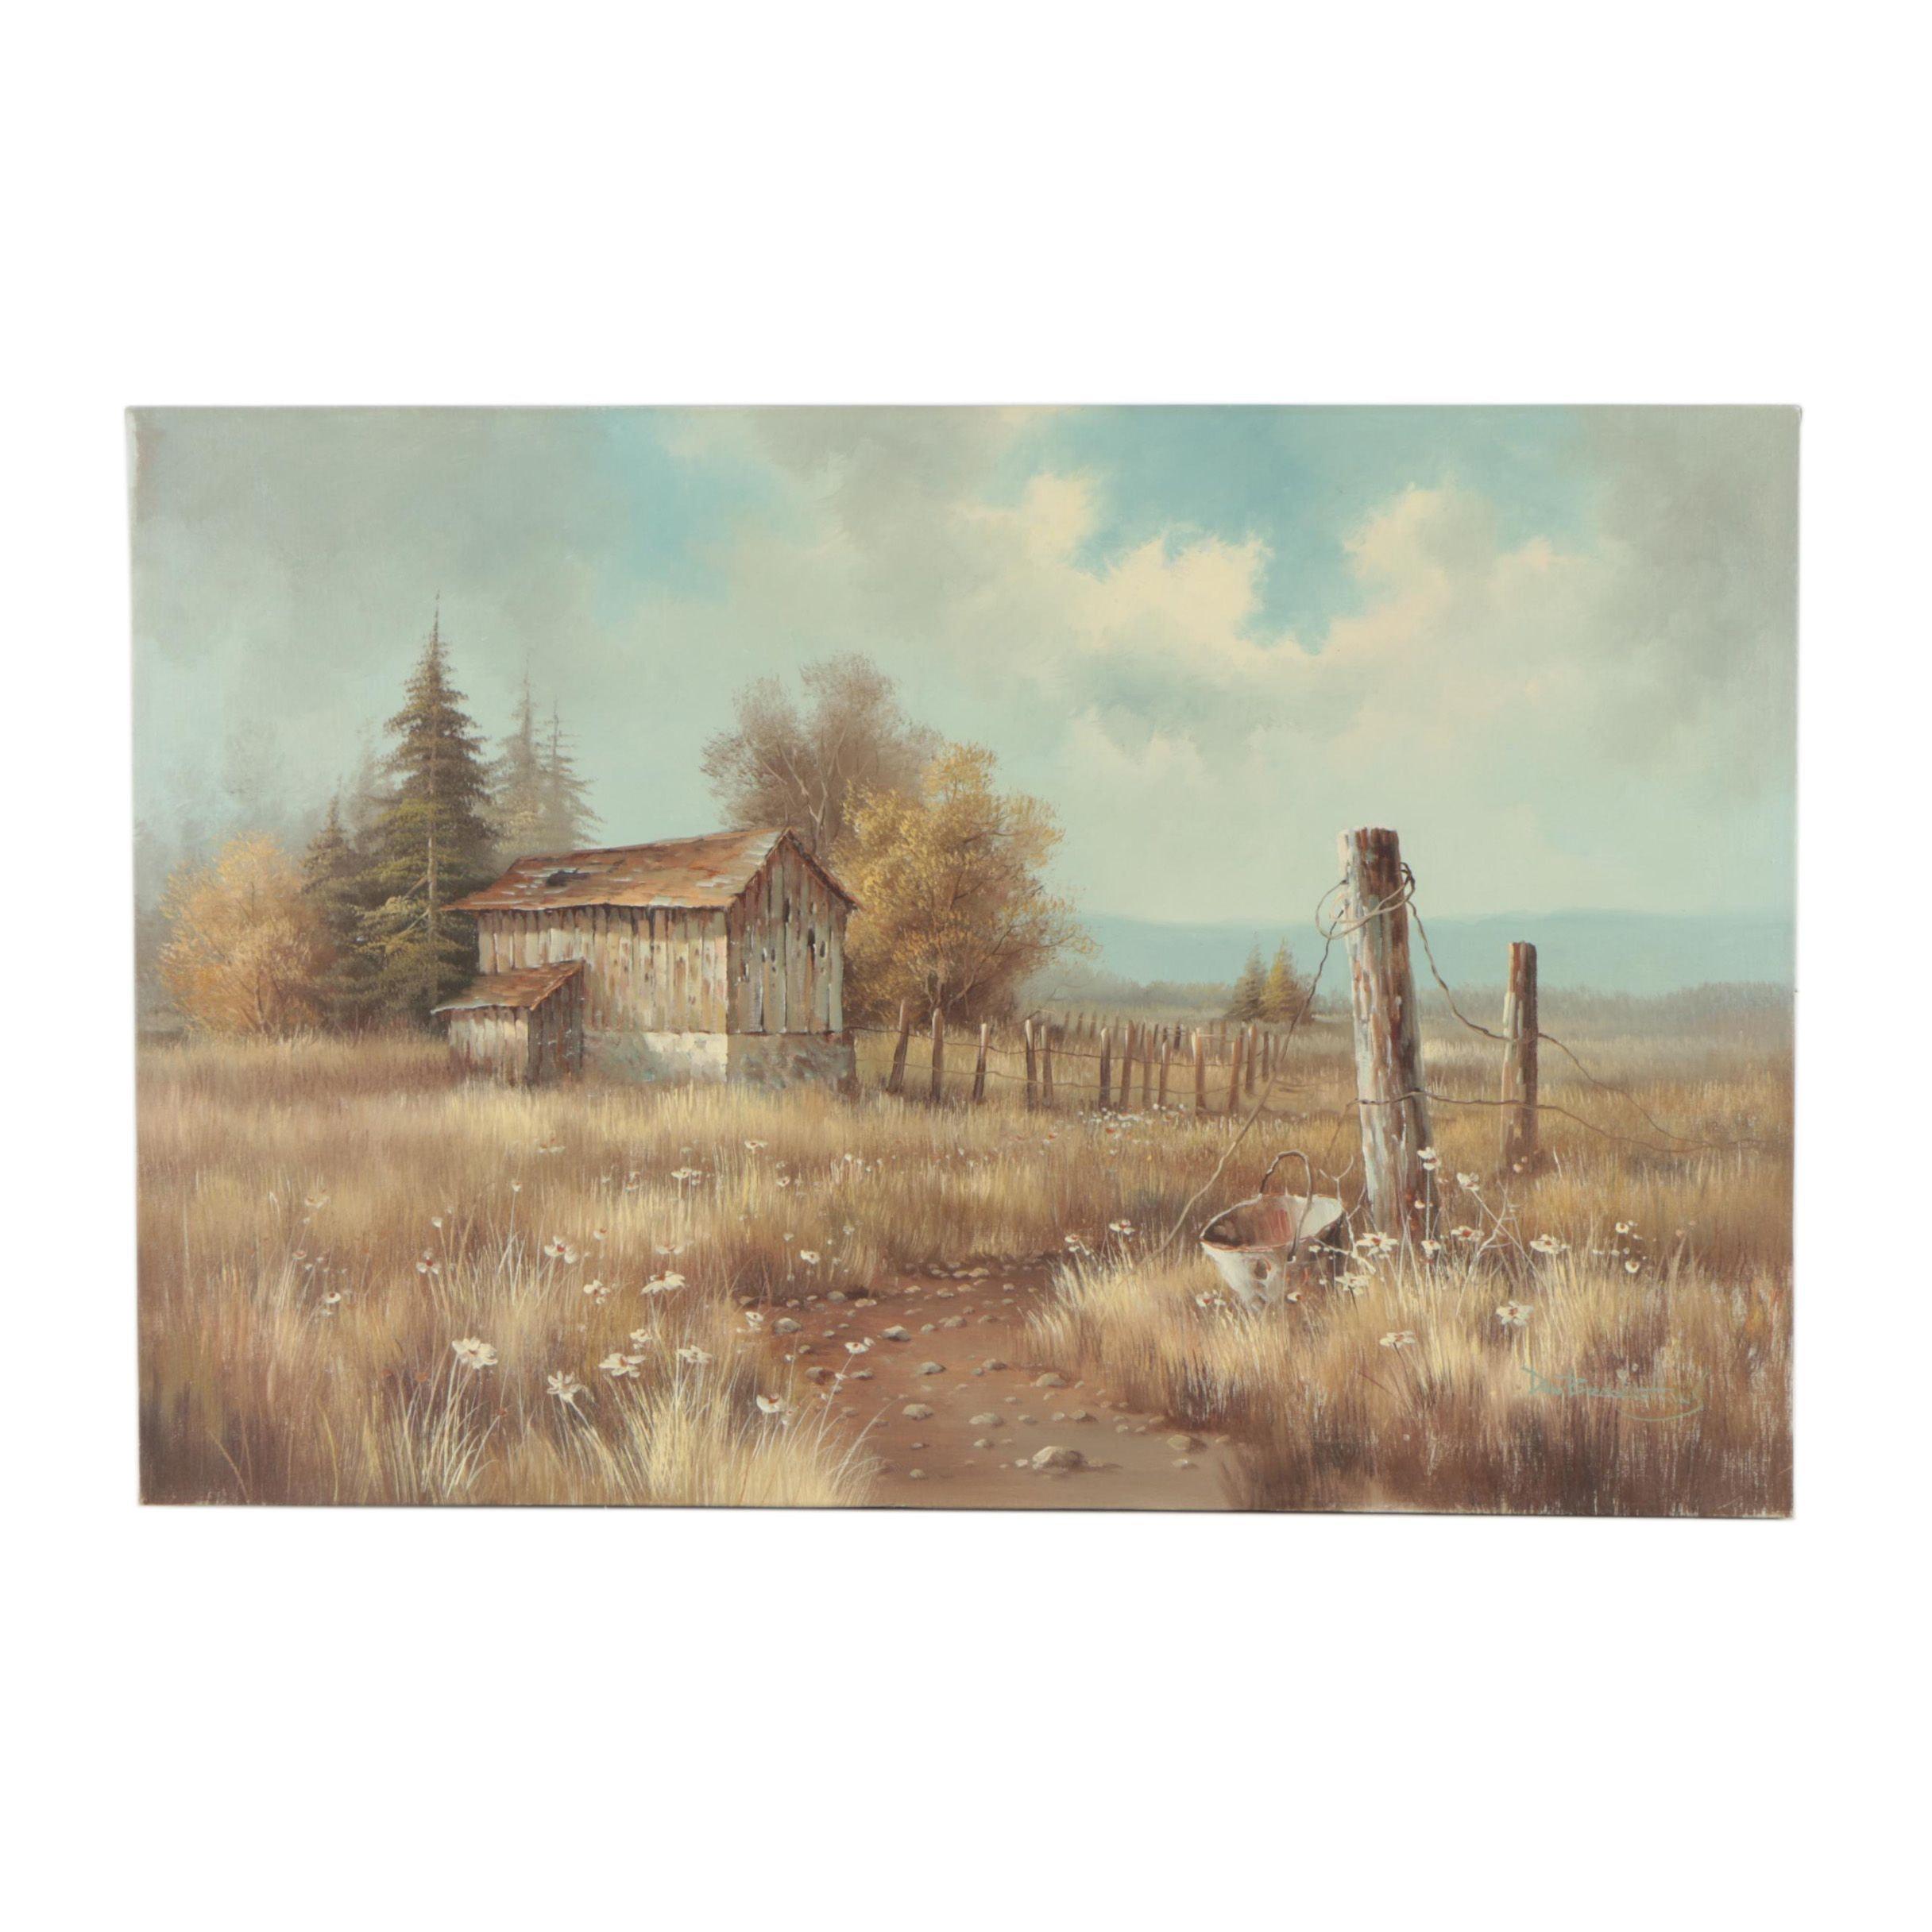 Oil Pastoral Landscape Painting on Canvas